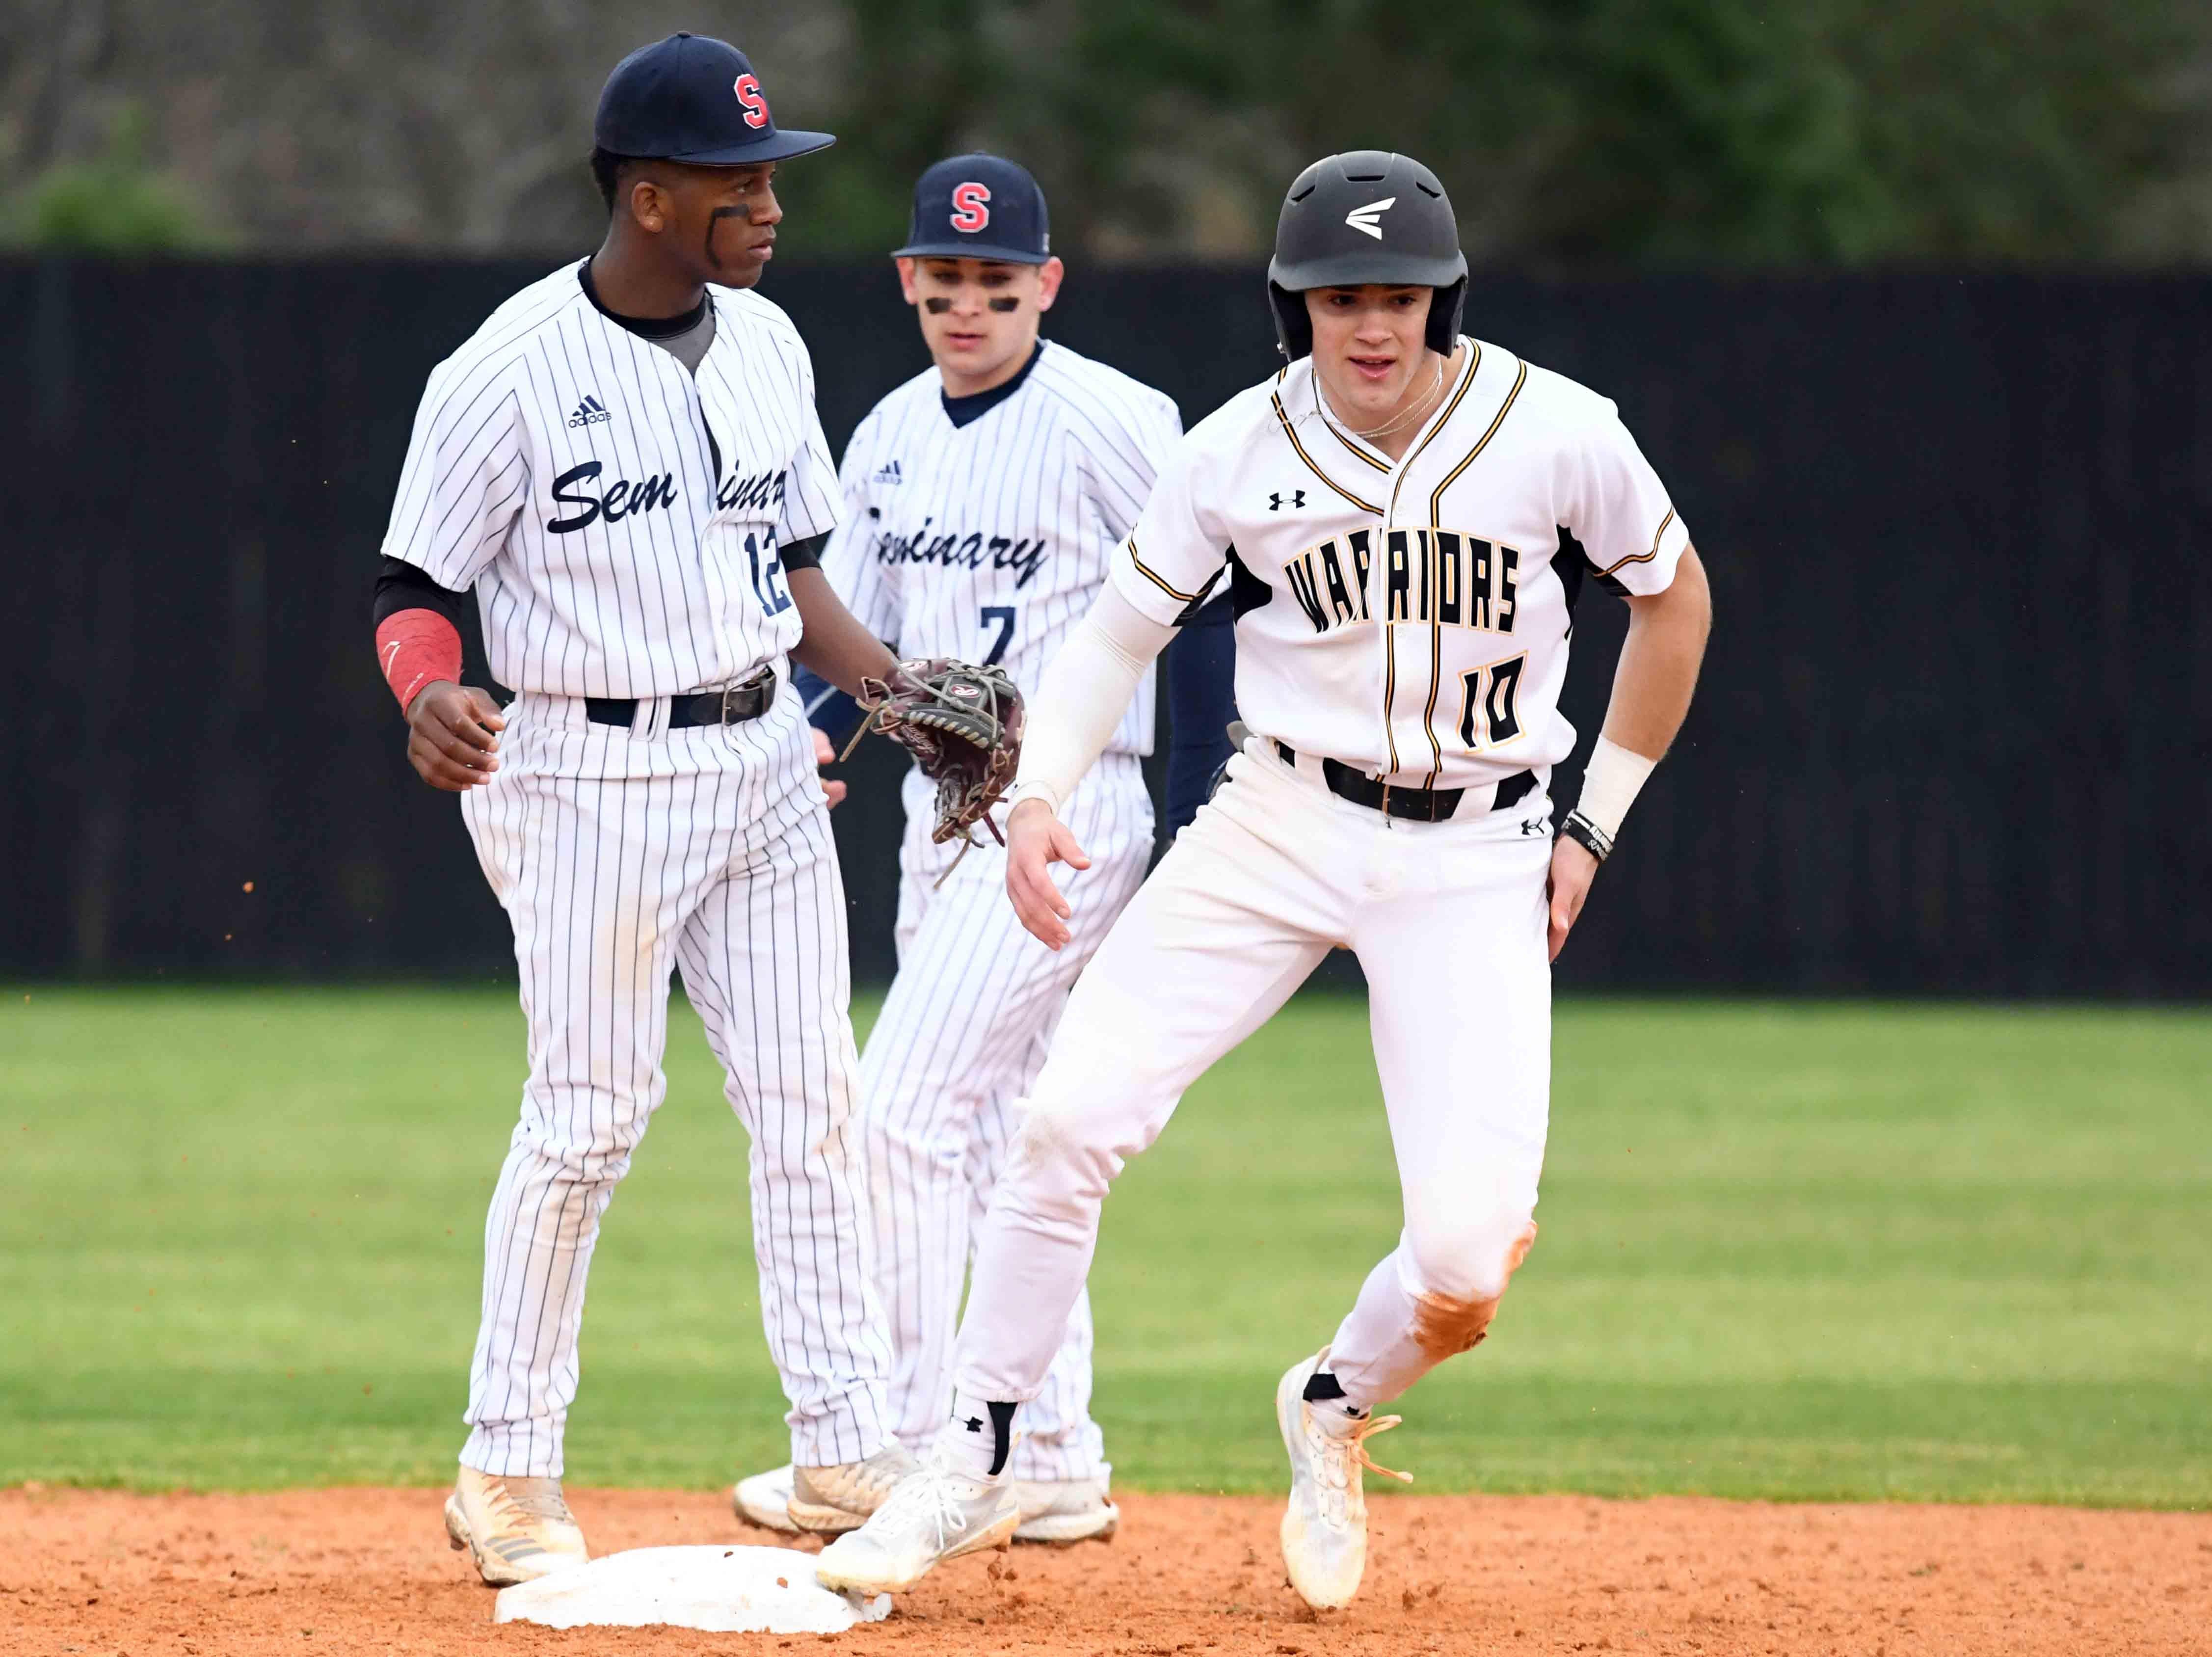 Oak Grove senior John Rhys Plumlee makes it to second base in their season opener against Seminary in Hattiesburg on Monday, February 18, 2019.